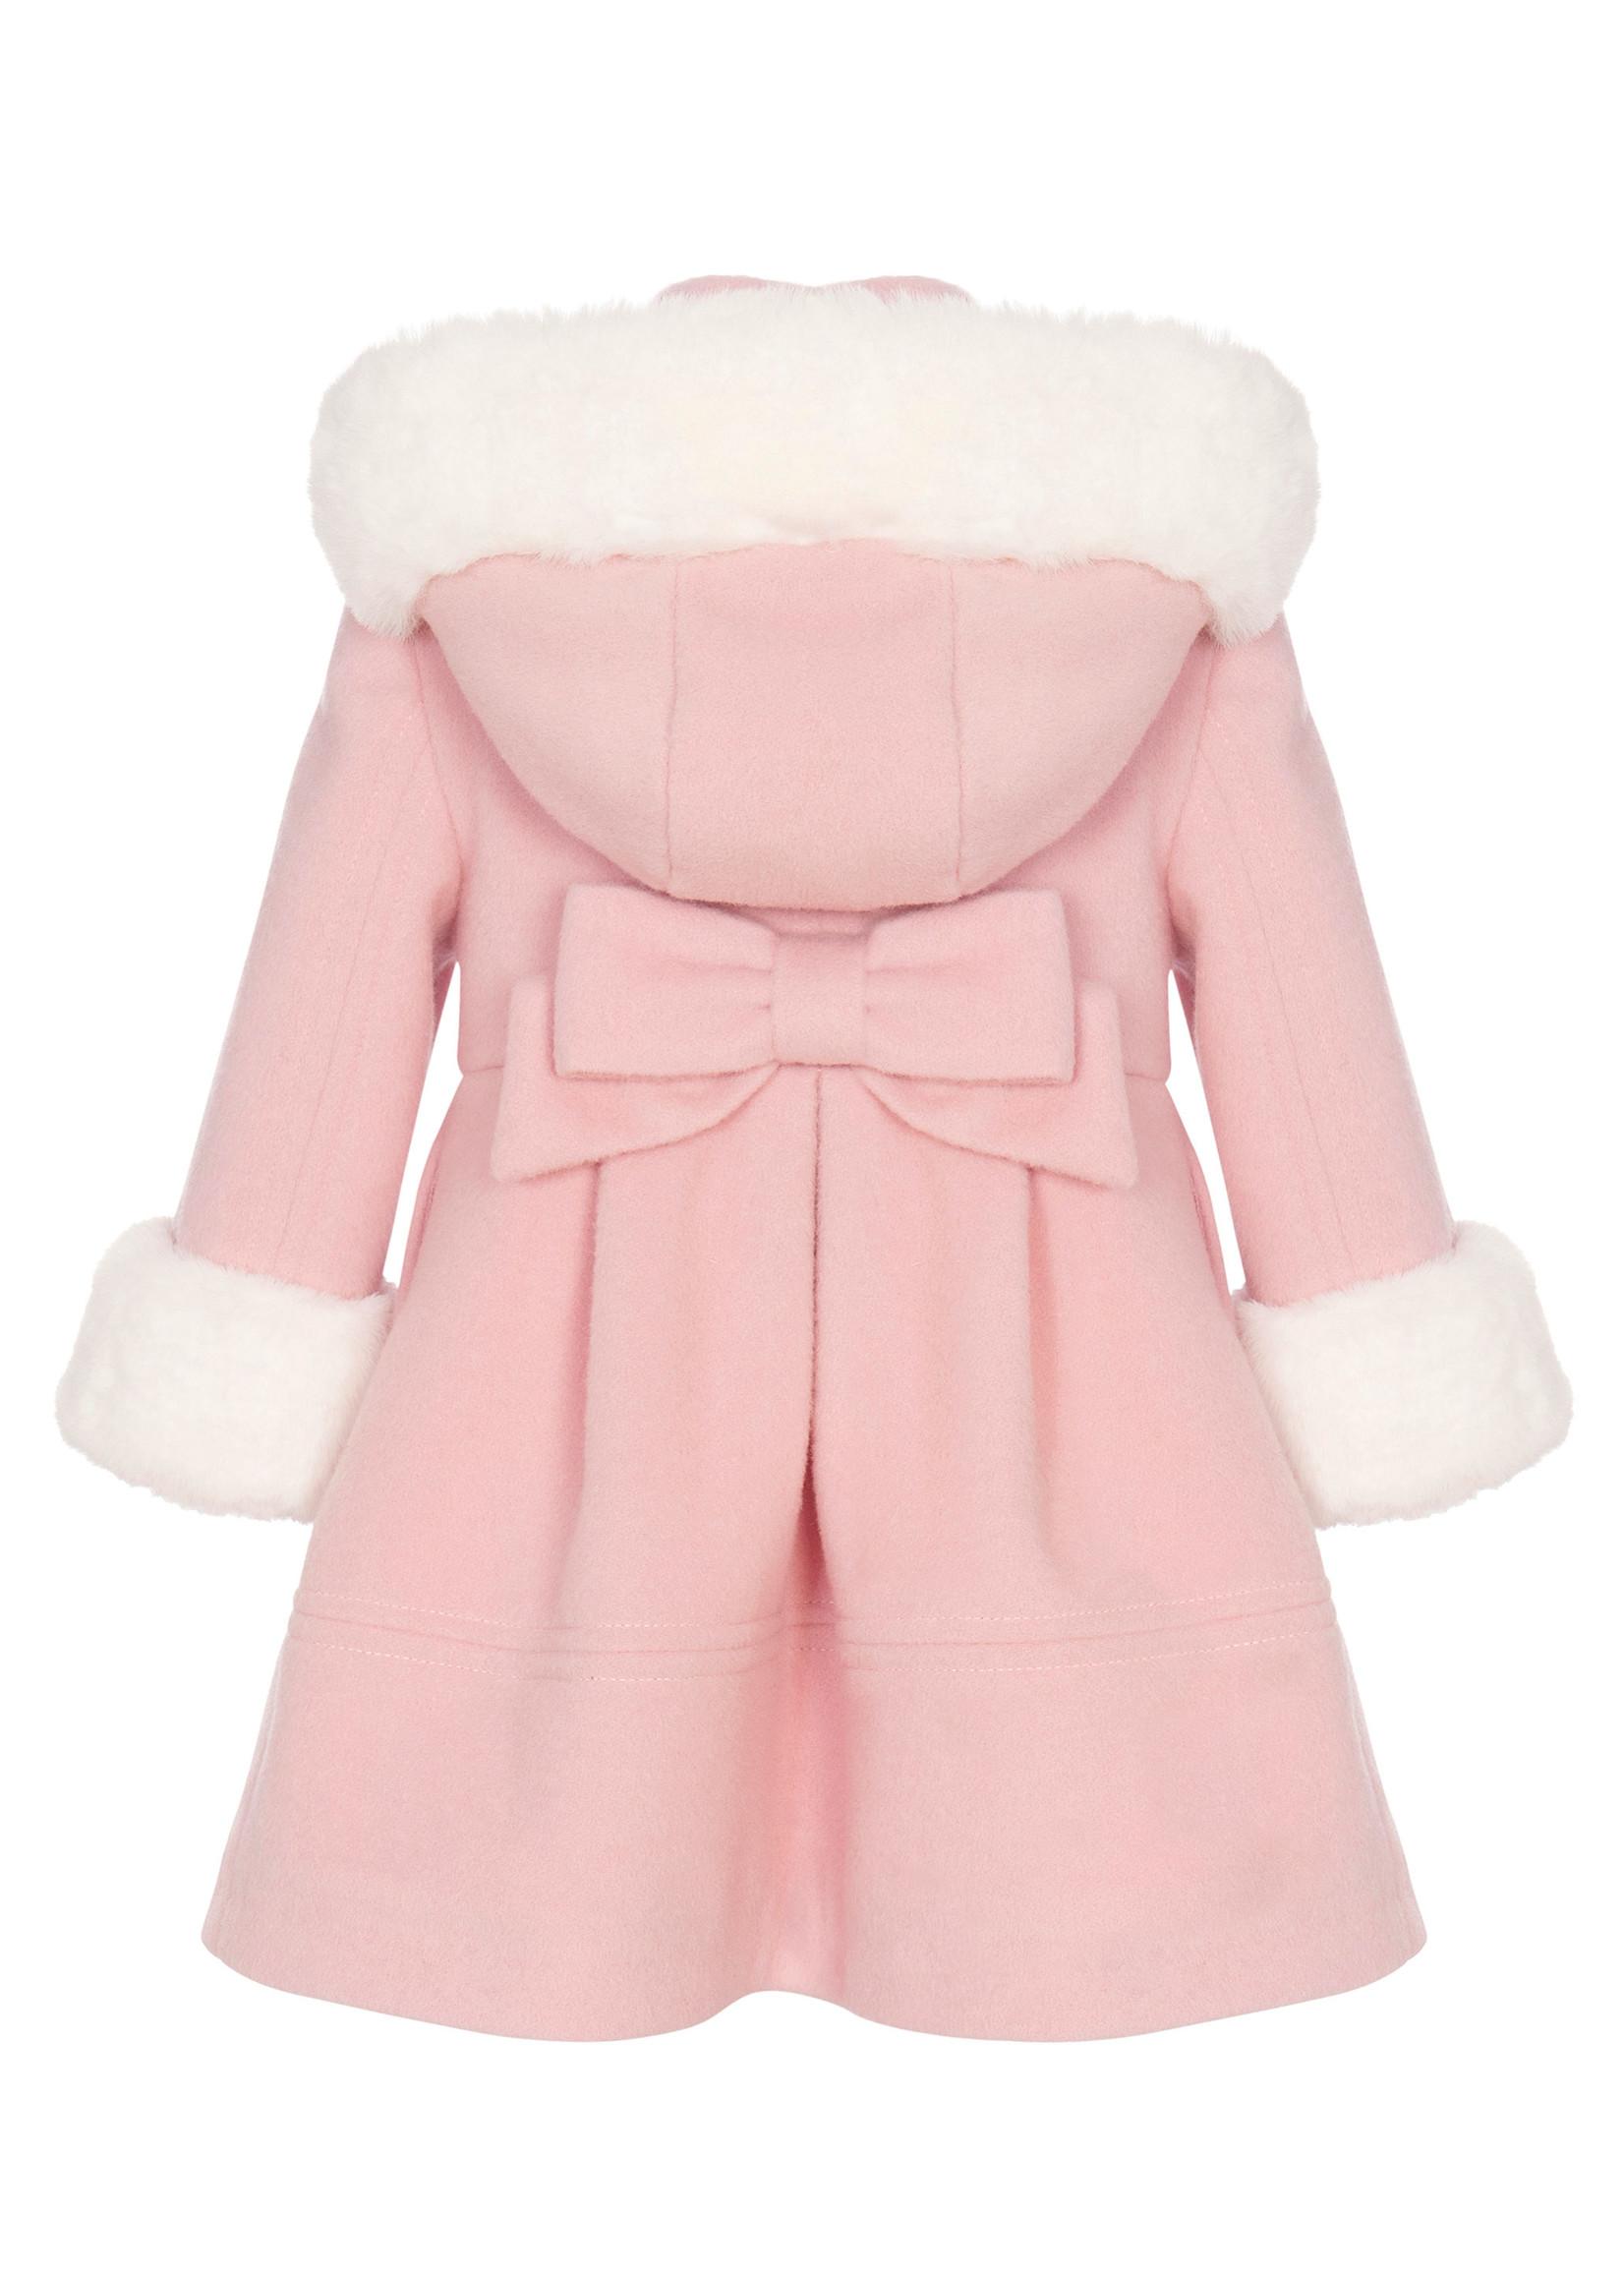 Balloon Chic Balloon Chic jacket pink